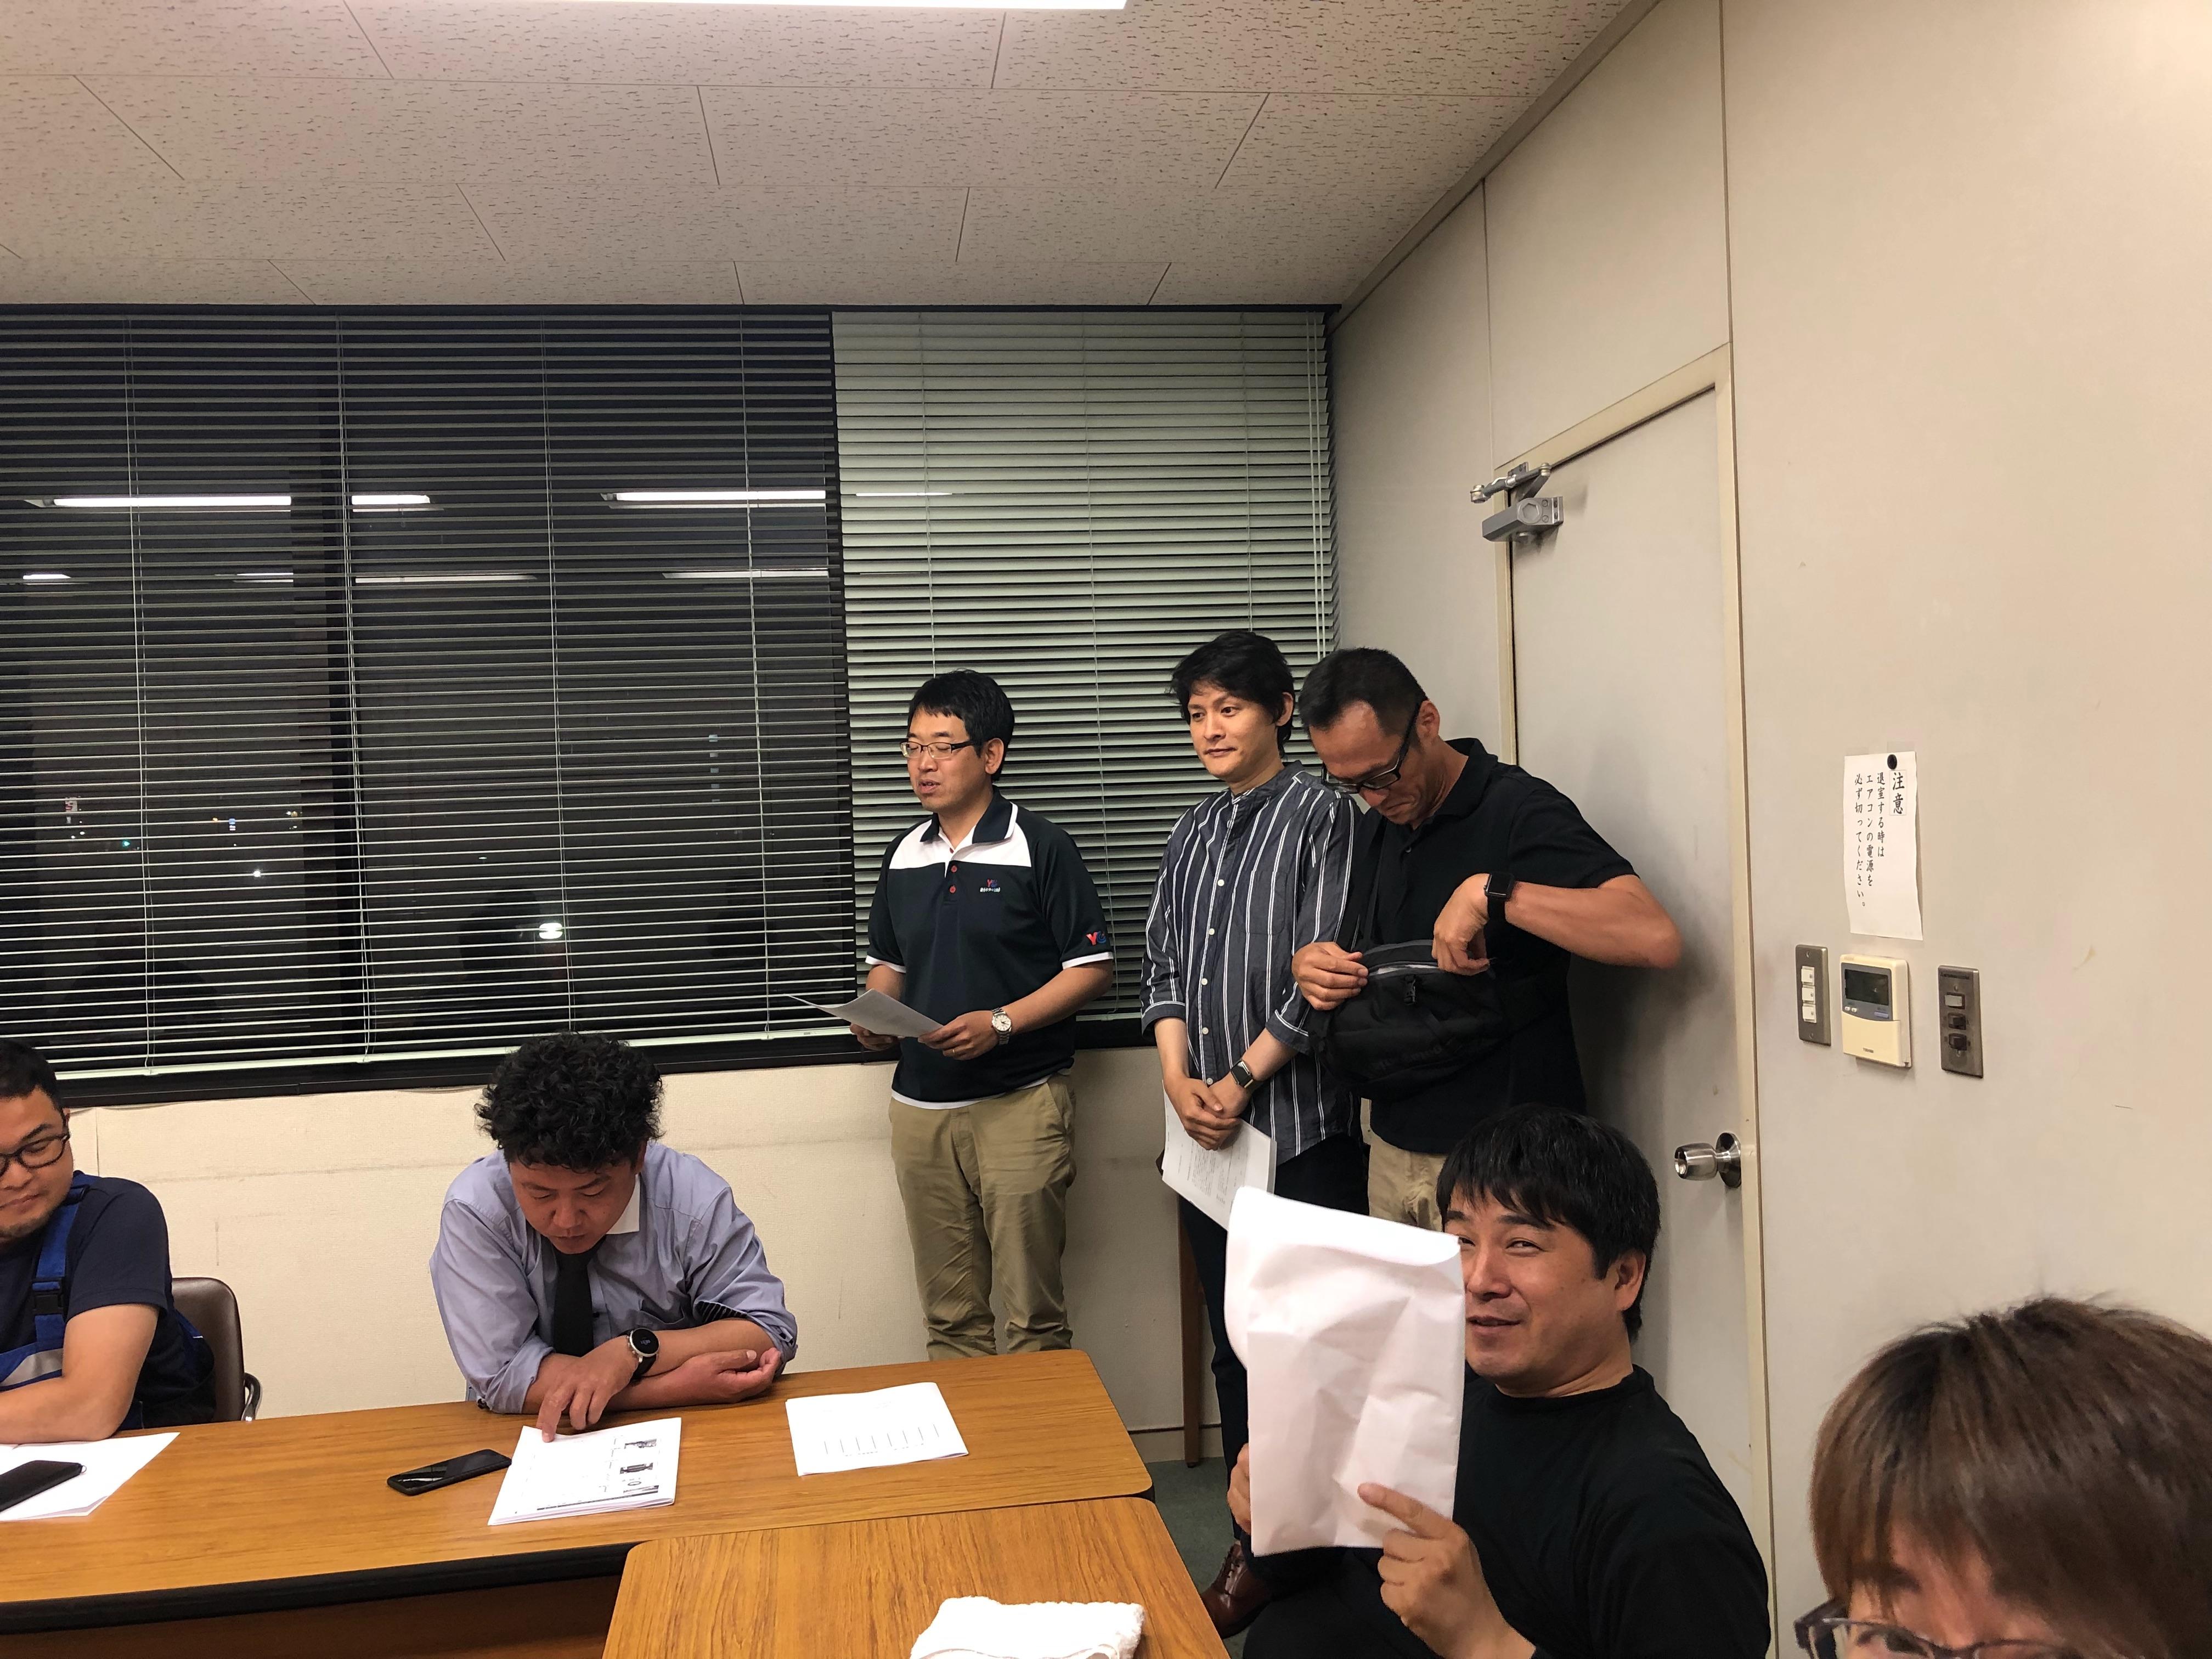 f:id:masanori-kato1972:20190605192359j:image